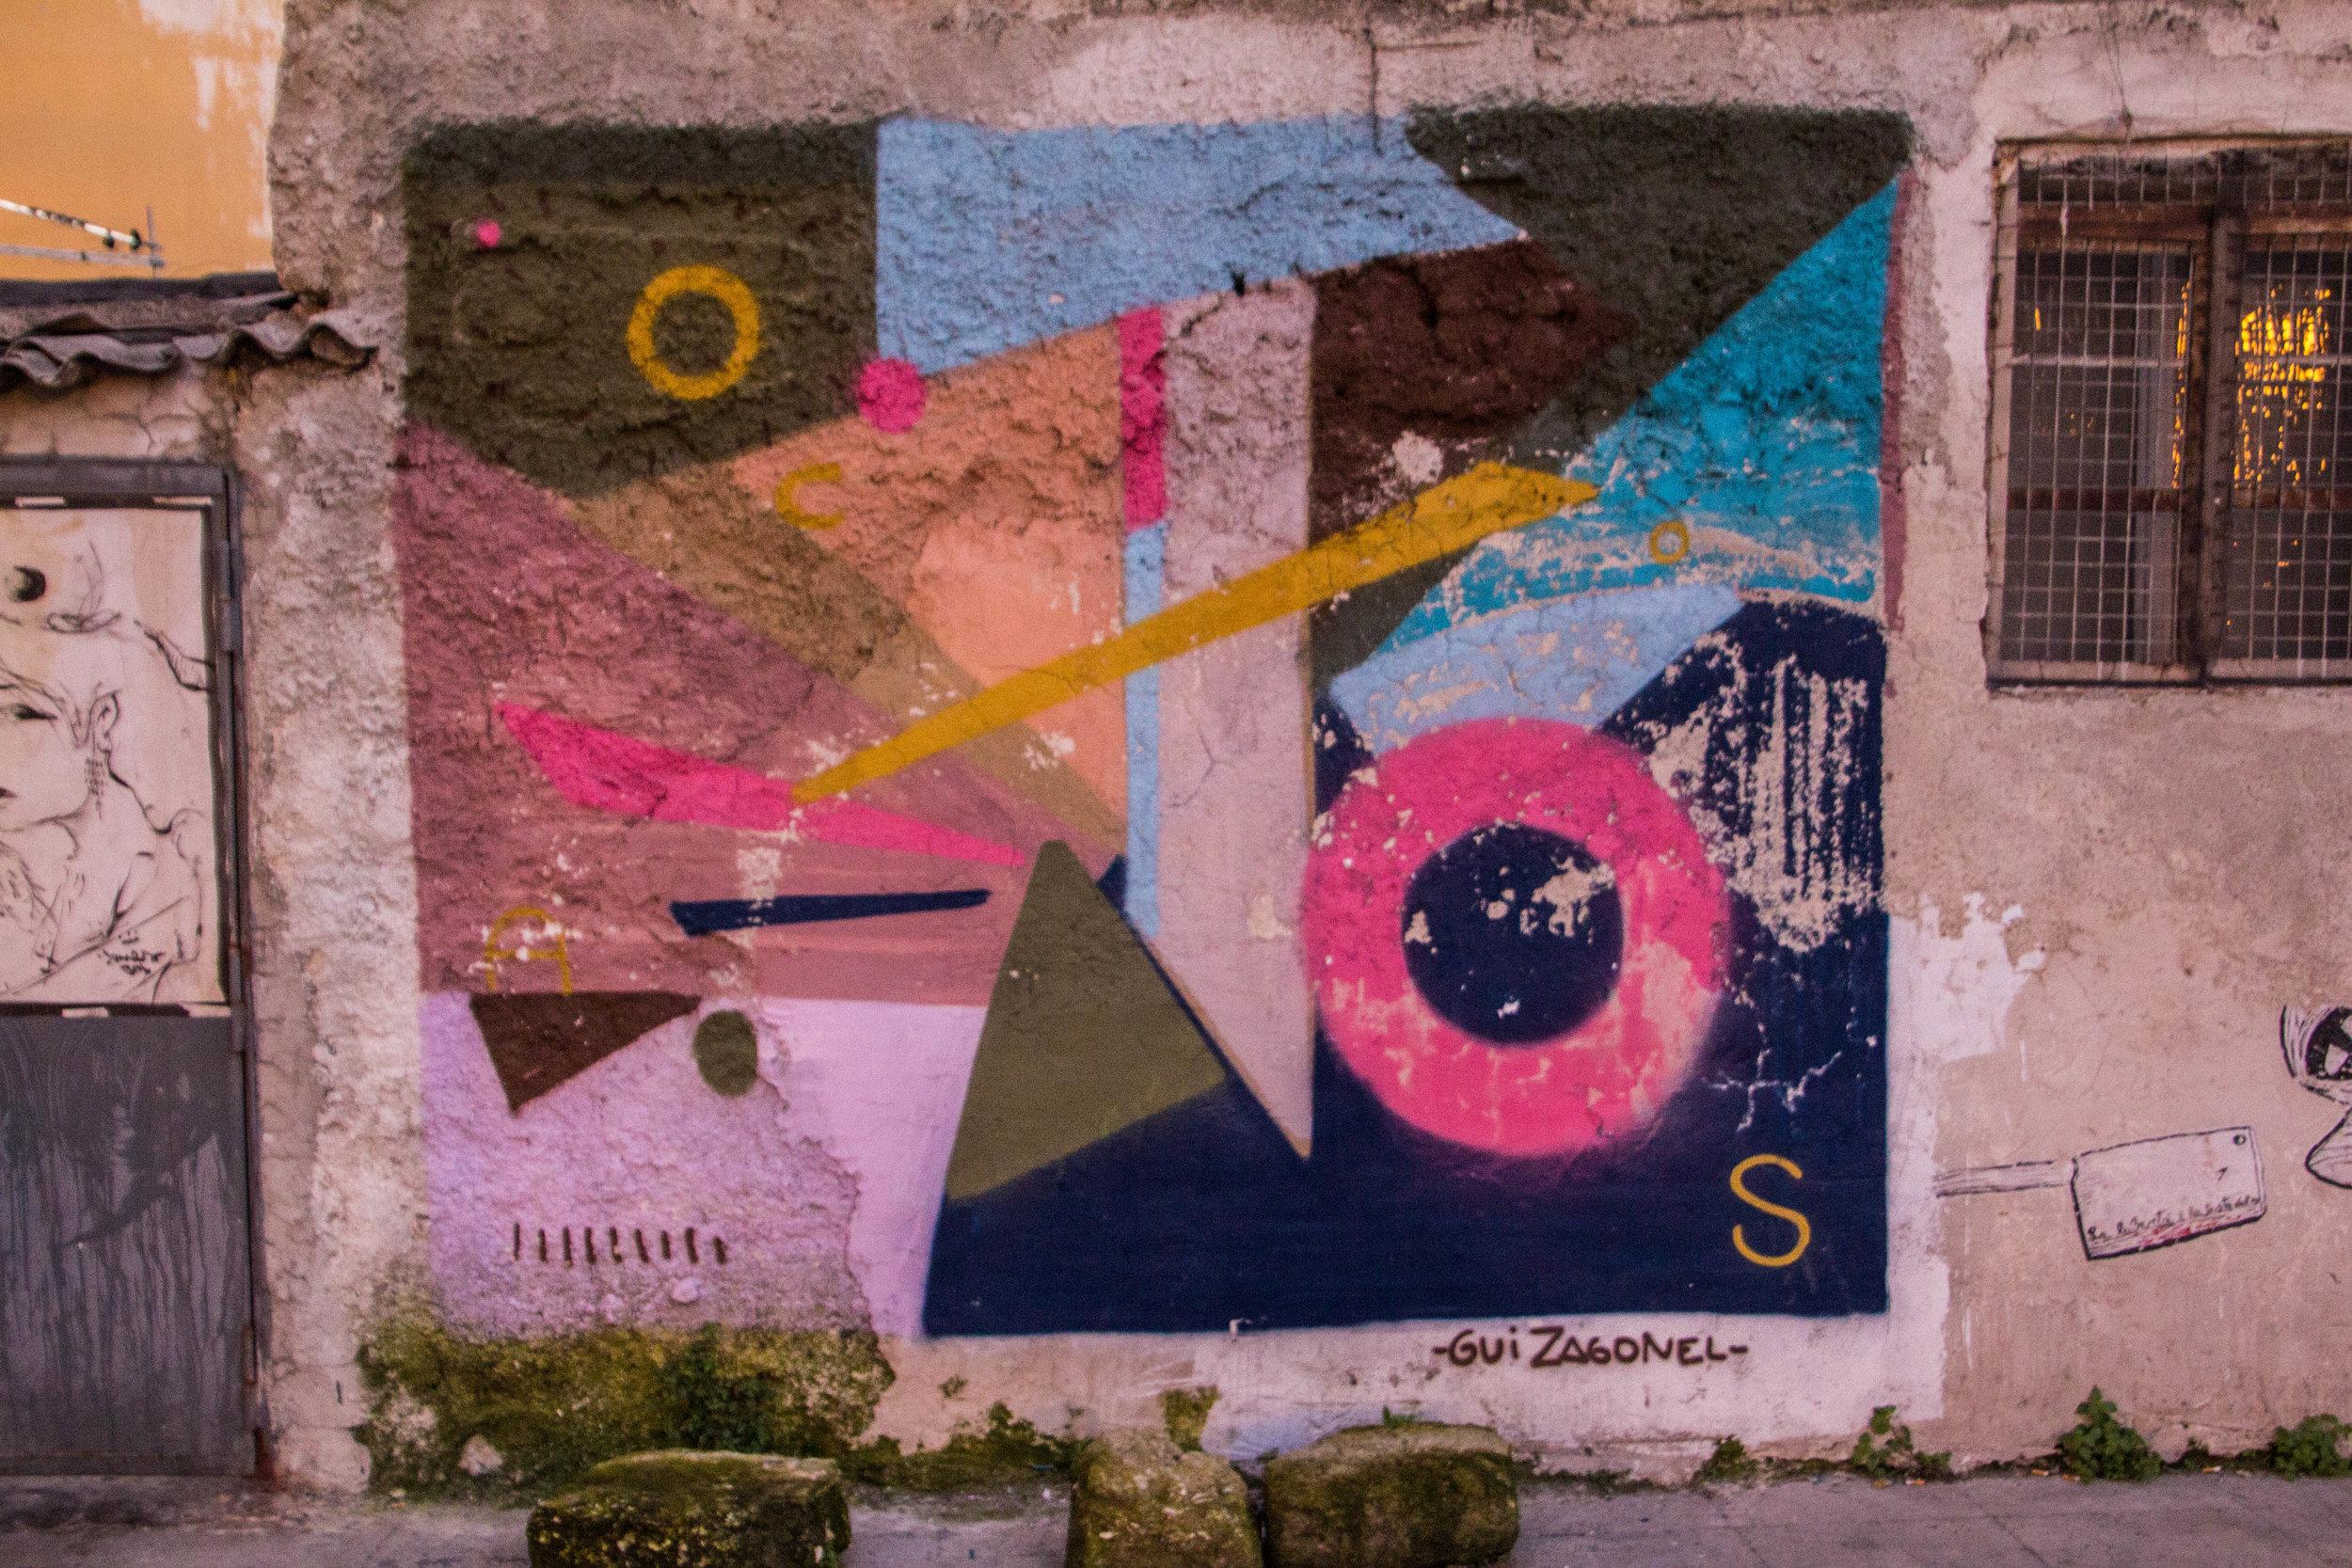 streets-palermo-sicily-54.jpg